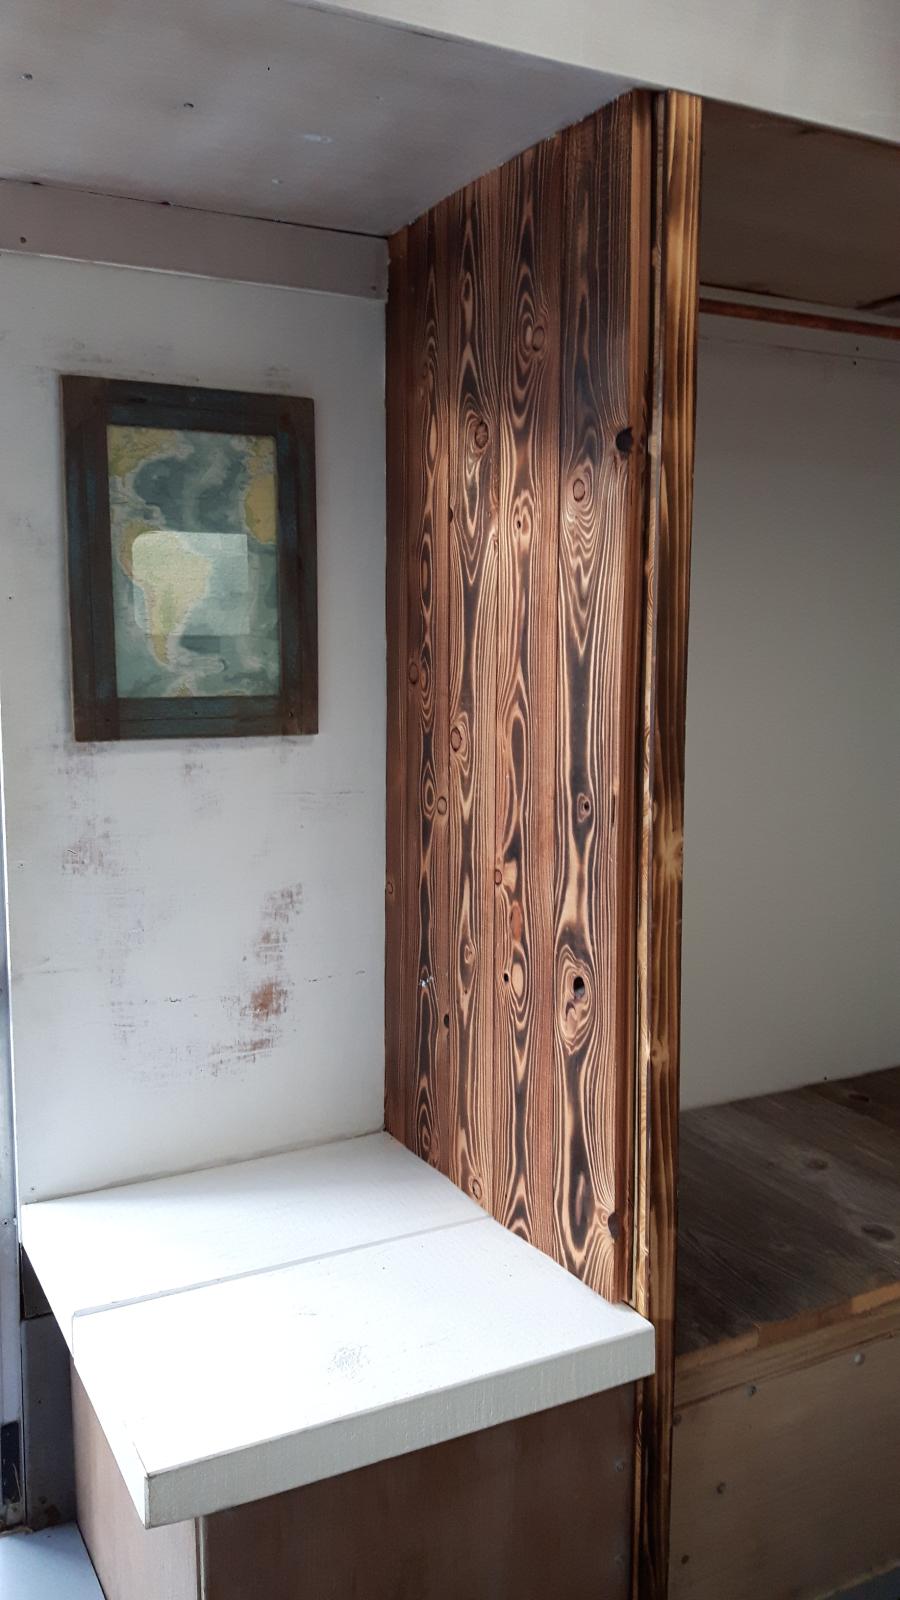 Sauber abgeflämmtes Holz.